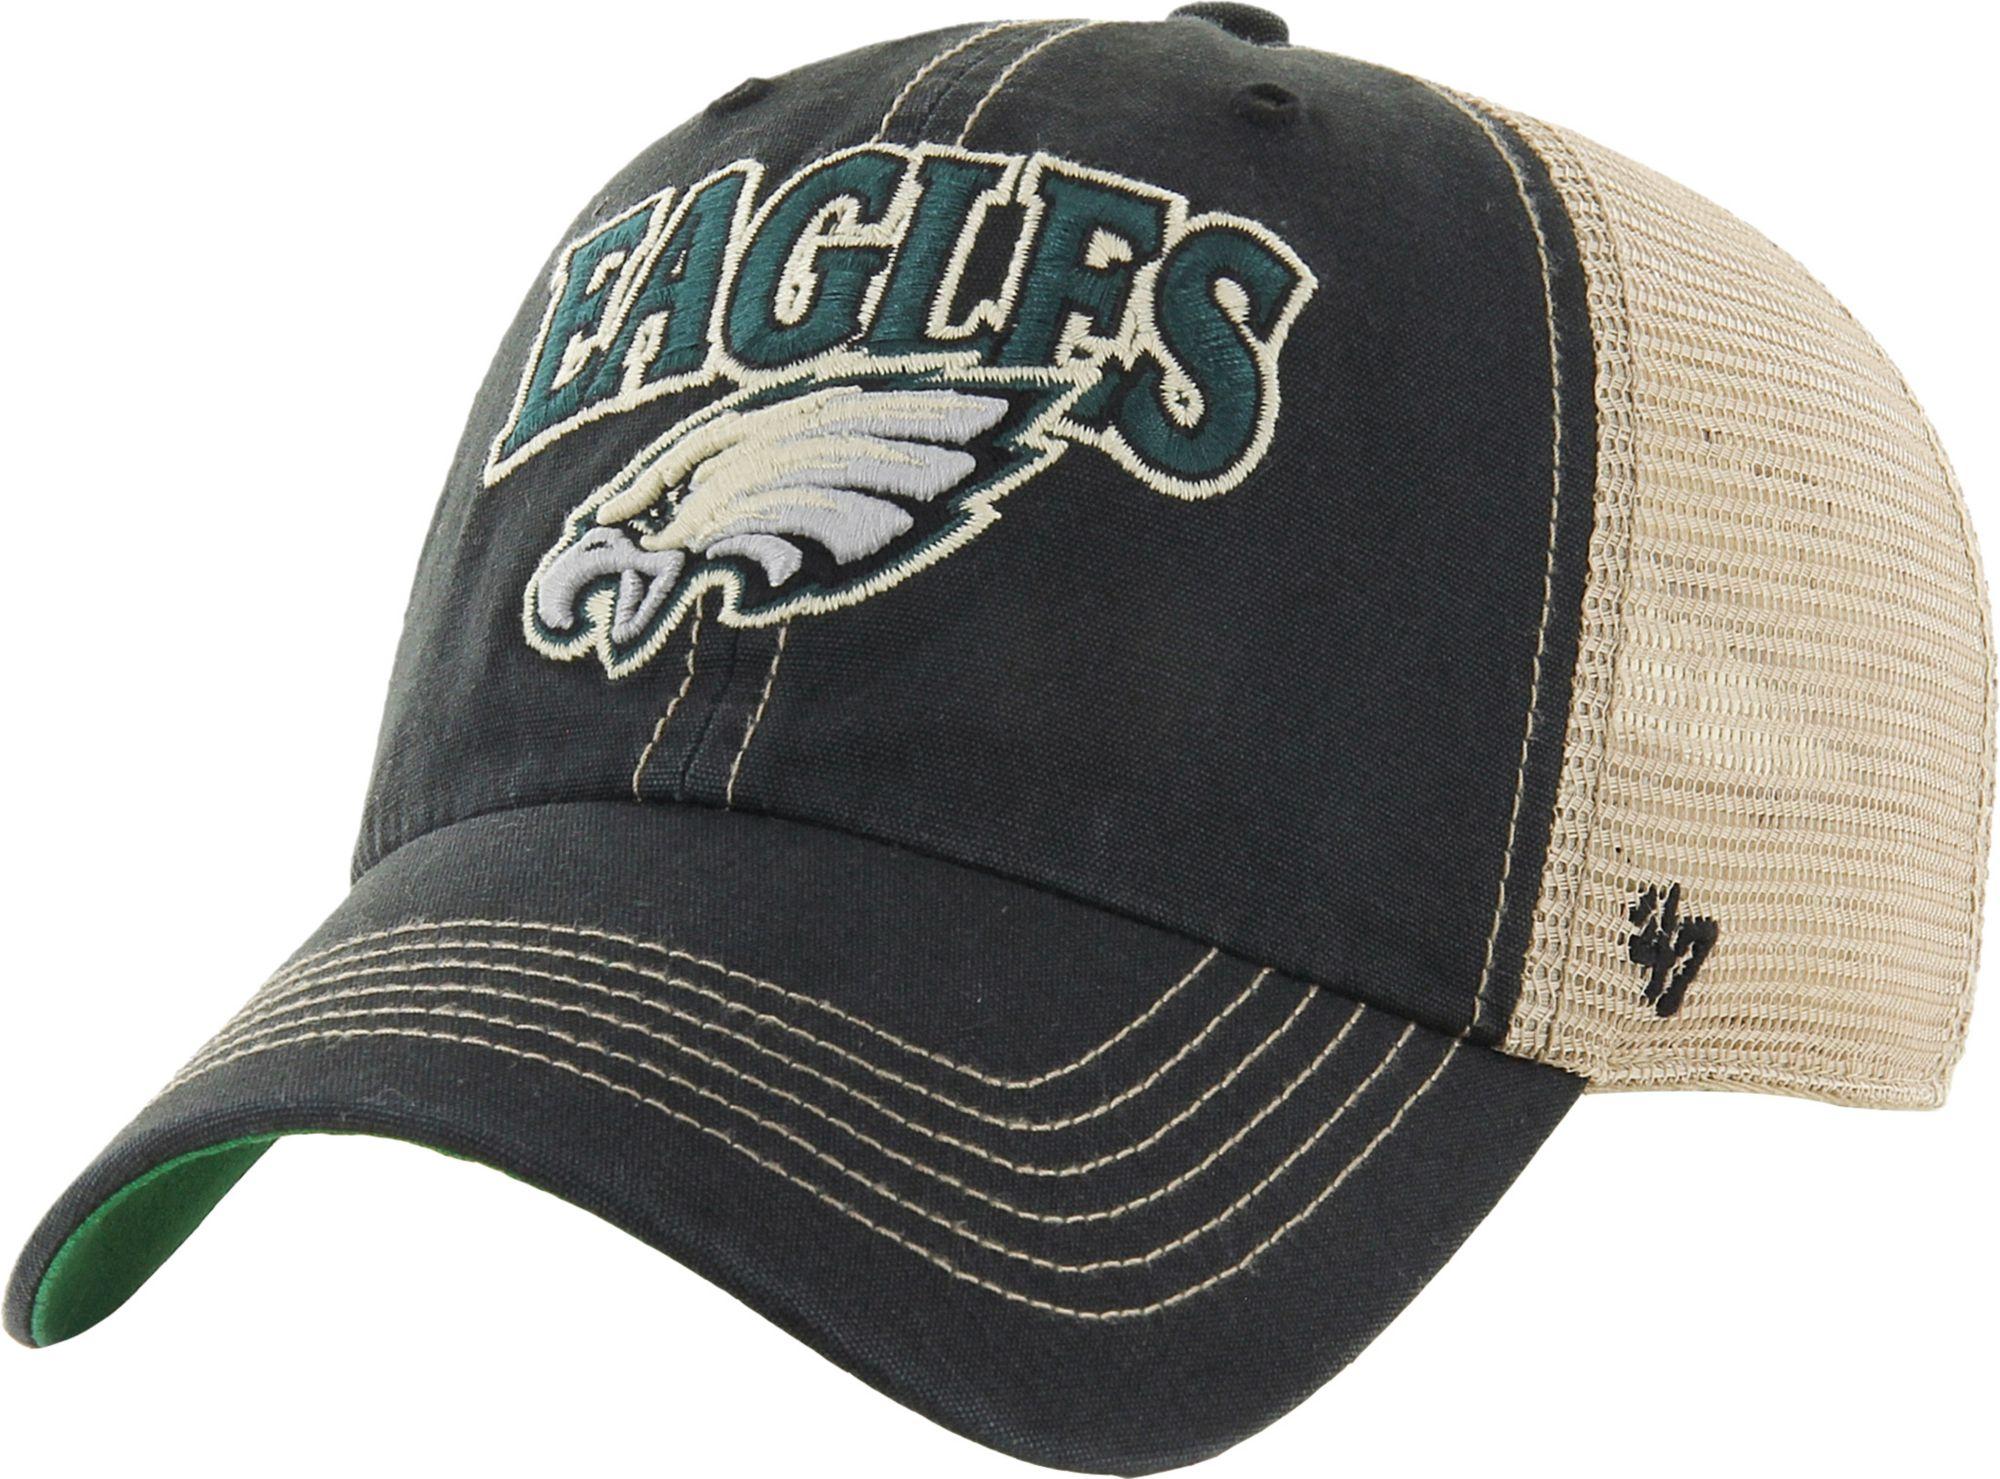 c5205534042 ... cheap 47 mens philadelphia eagles vintage tuscaloosa black adjustable  hat 43689 3e93d